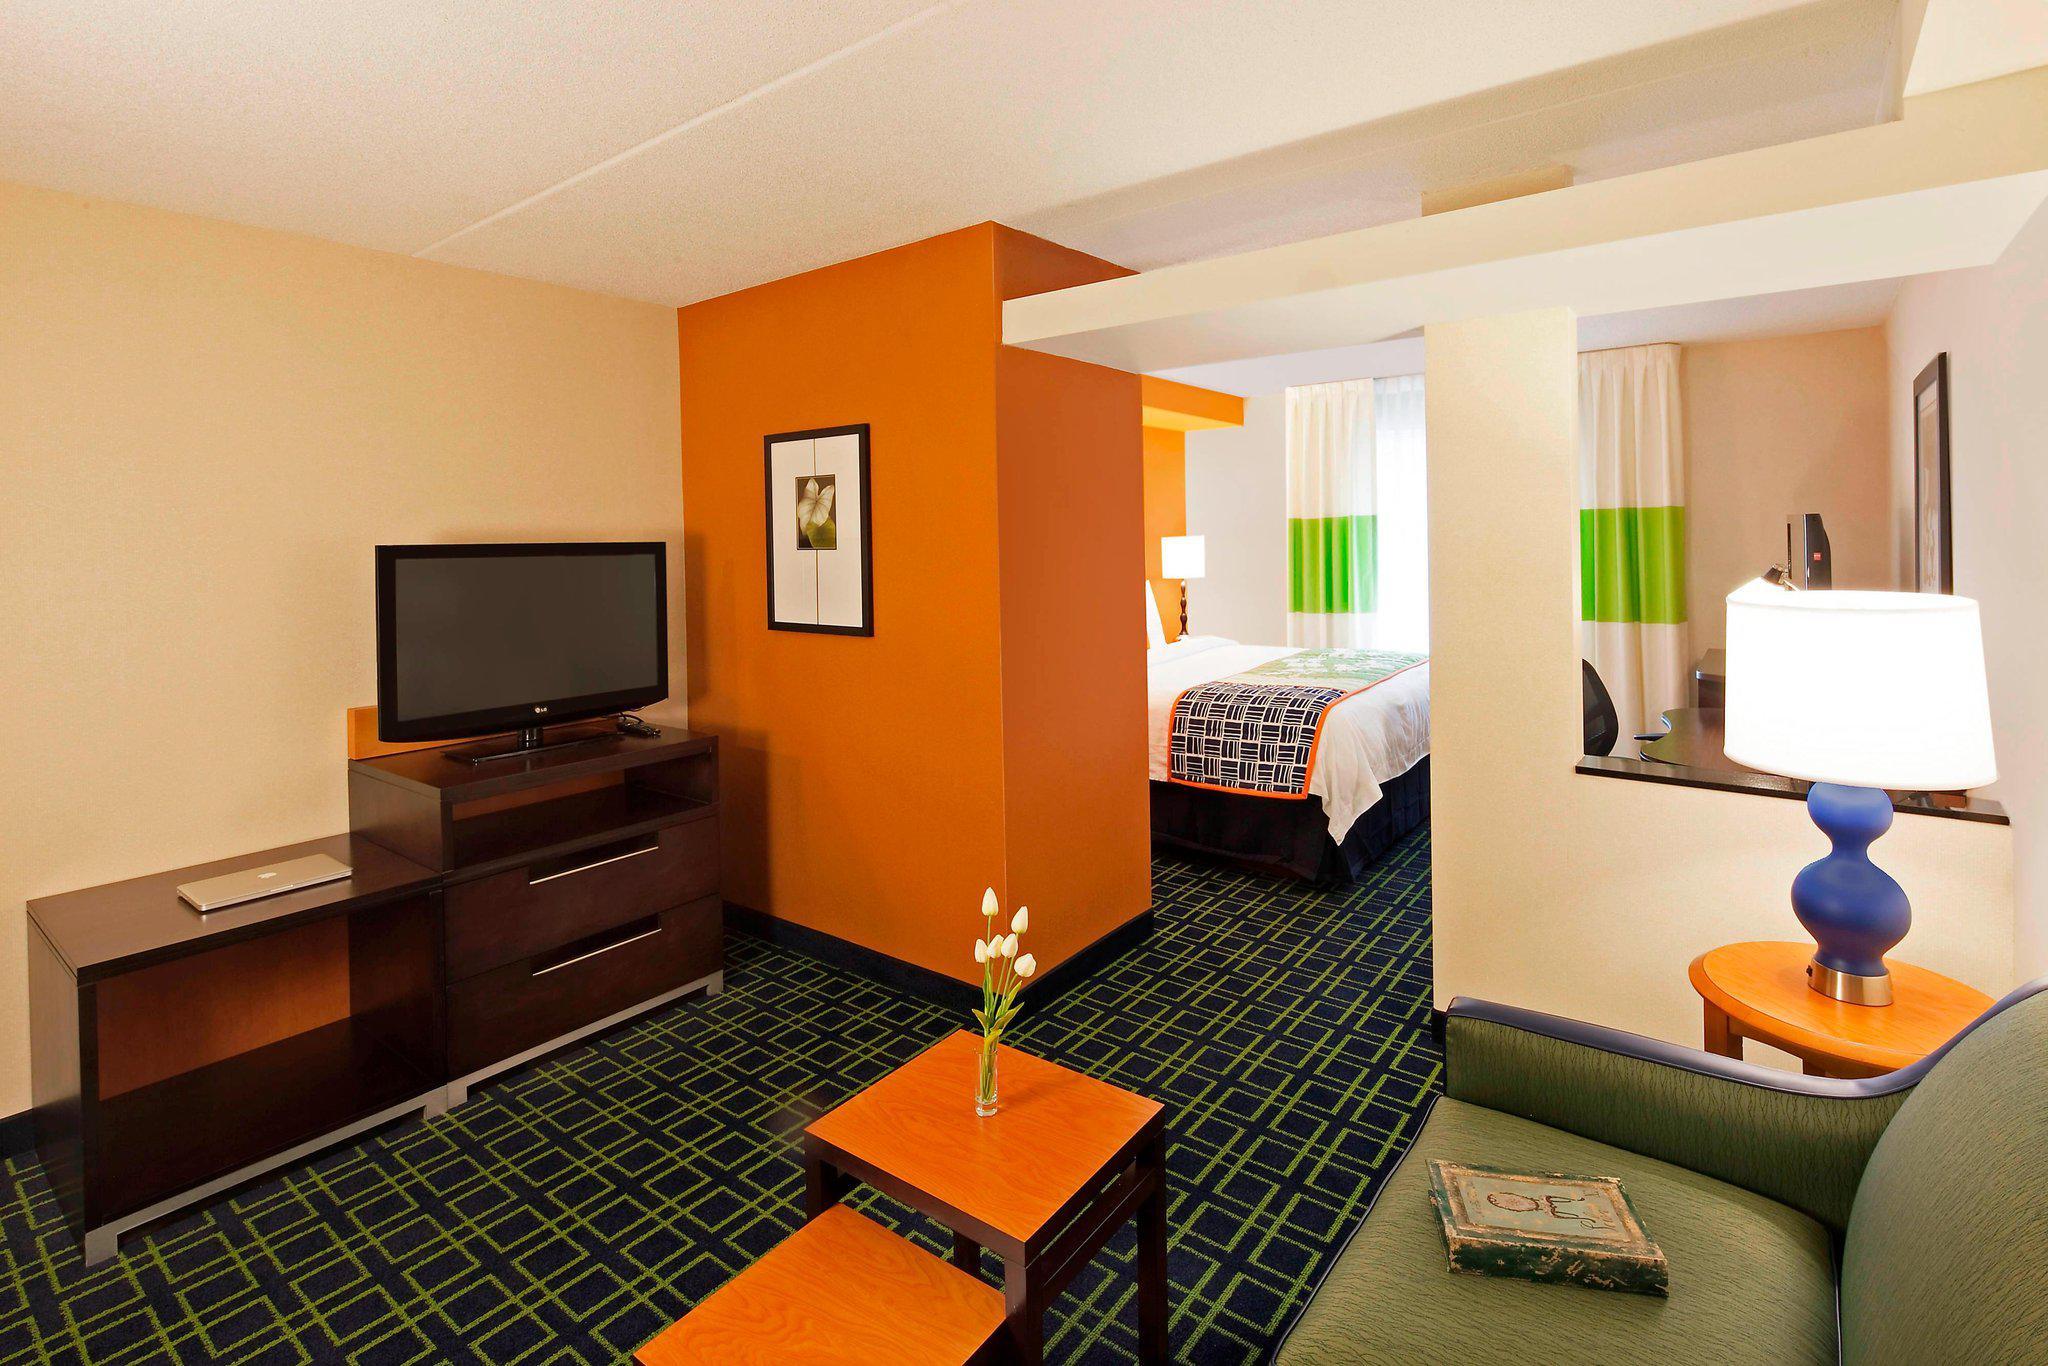 Fairfield Inn & Suites by Marriott Toronto Mississauga